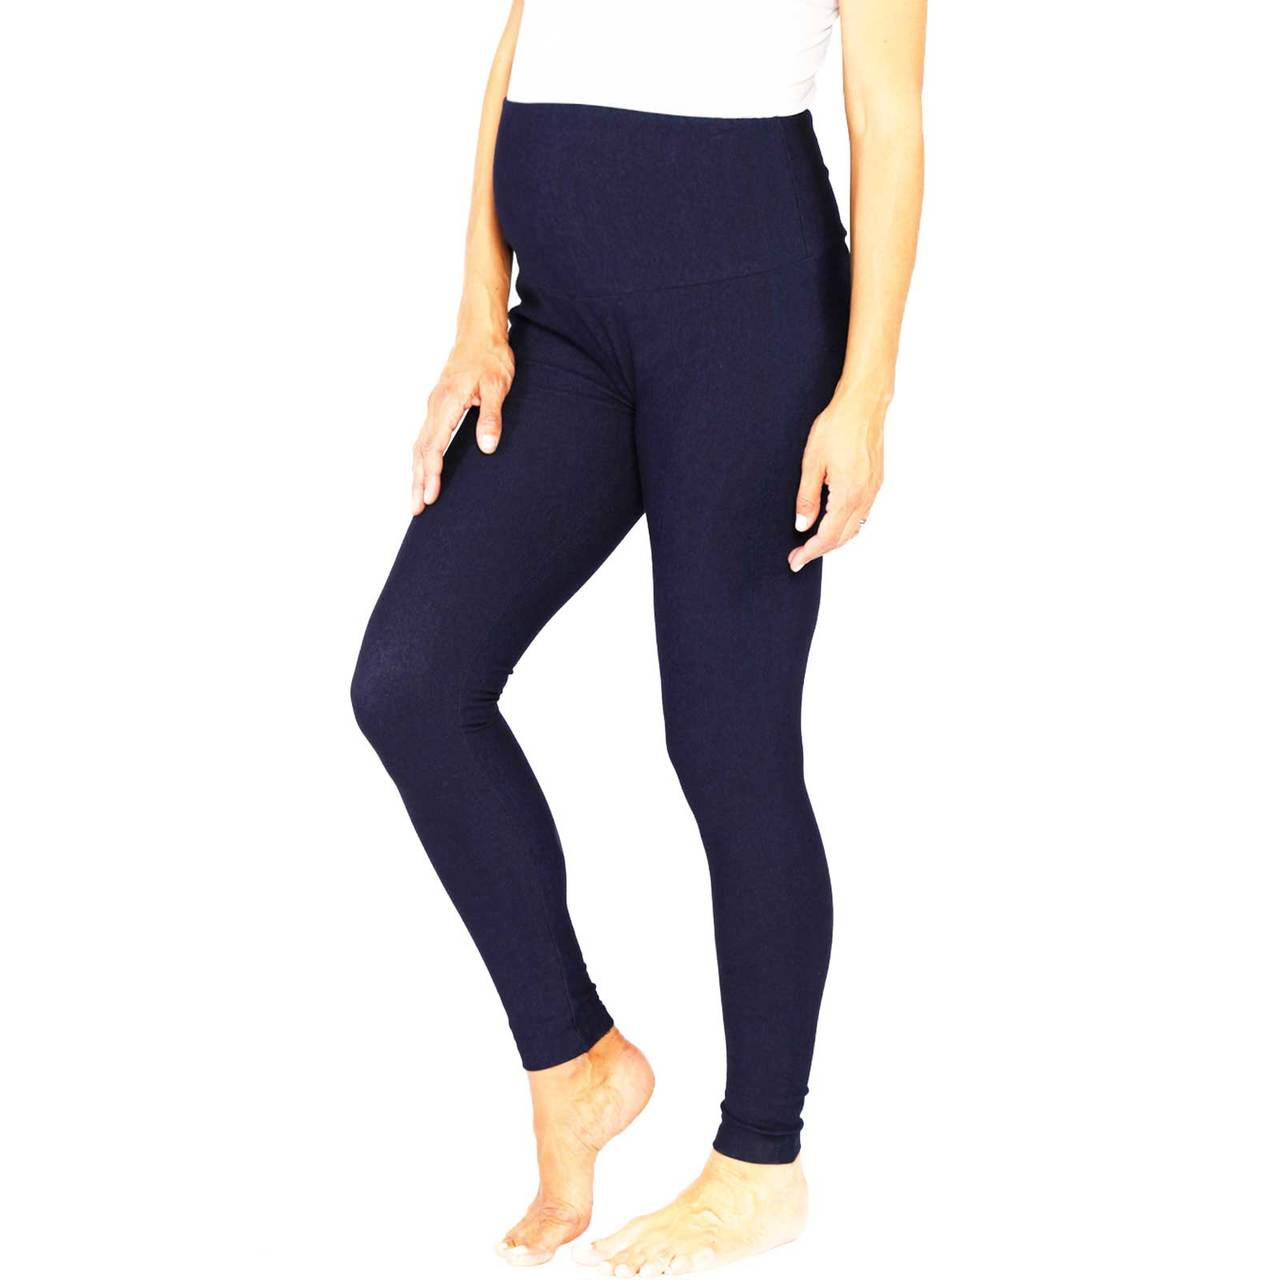 f886d28c558 Angel Maternity High Waisted Navy Denim Jeggings - Buy Pregnancy Pants